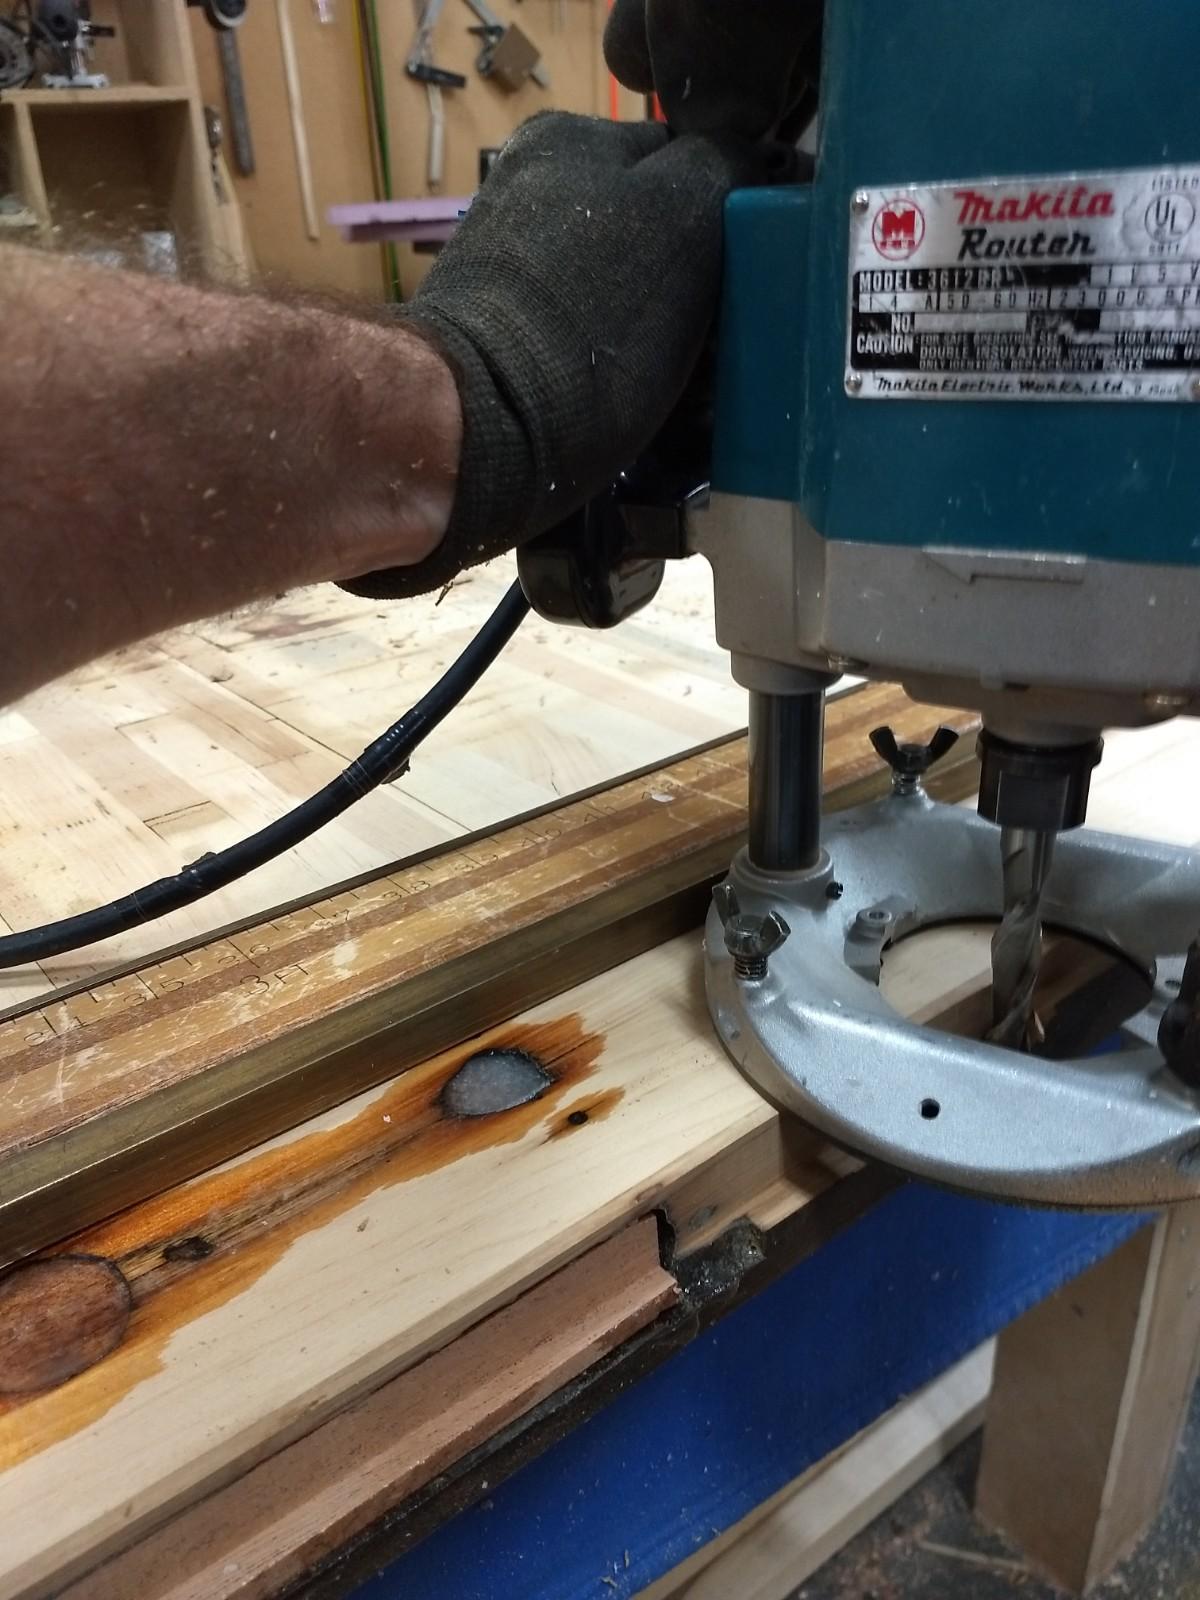 Shaving off knob edge